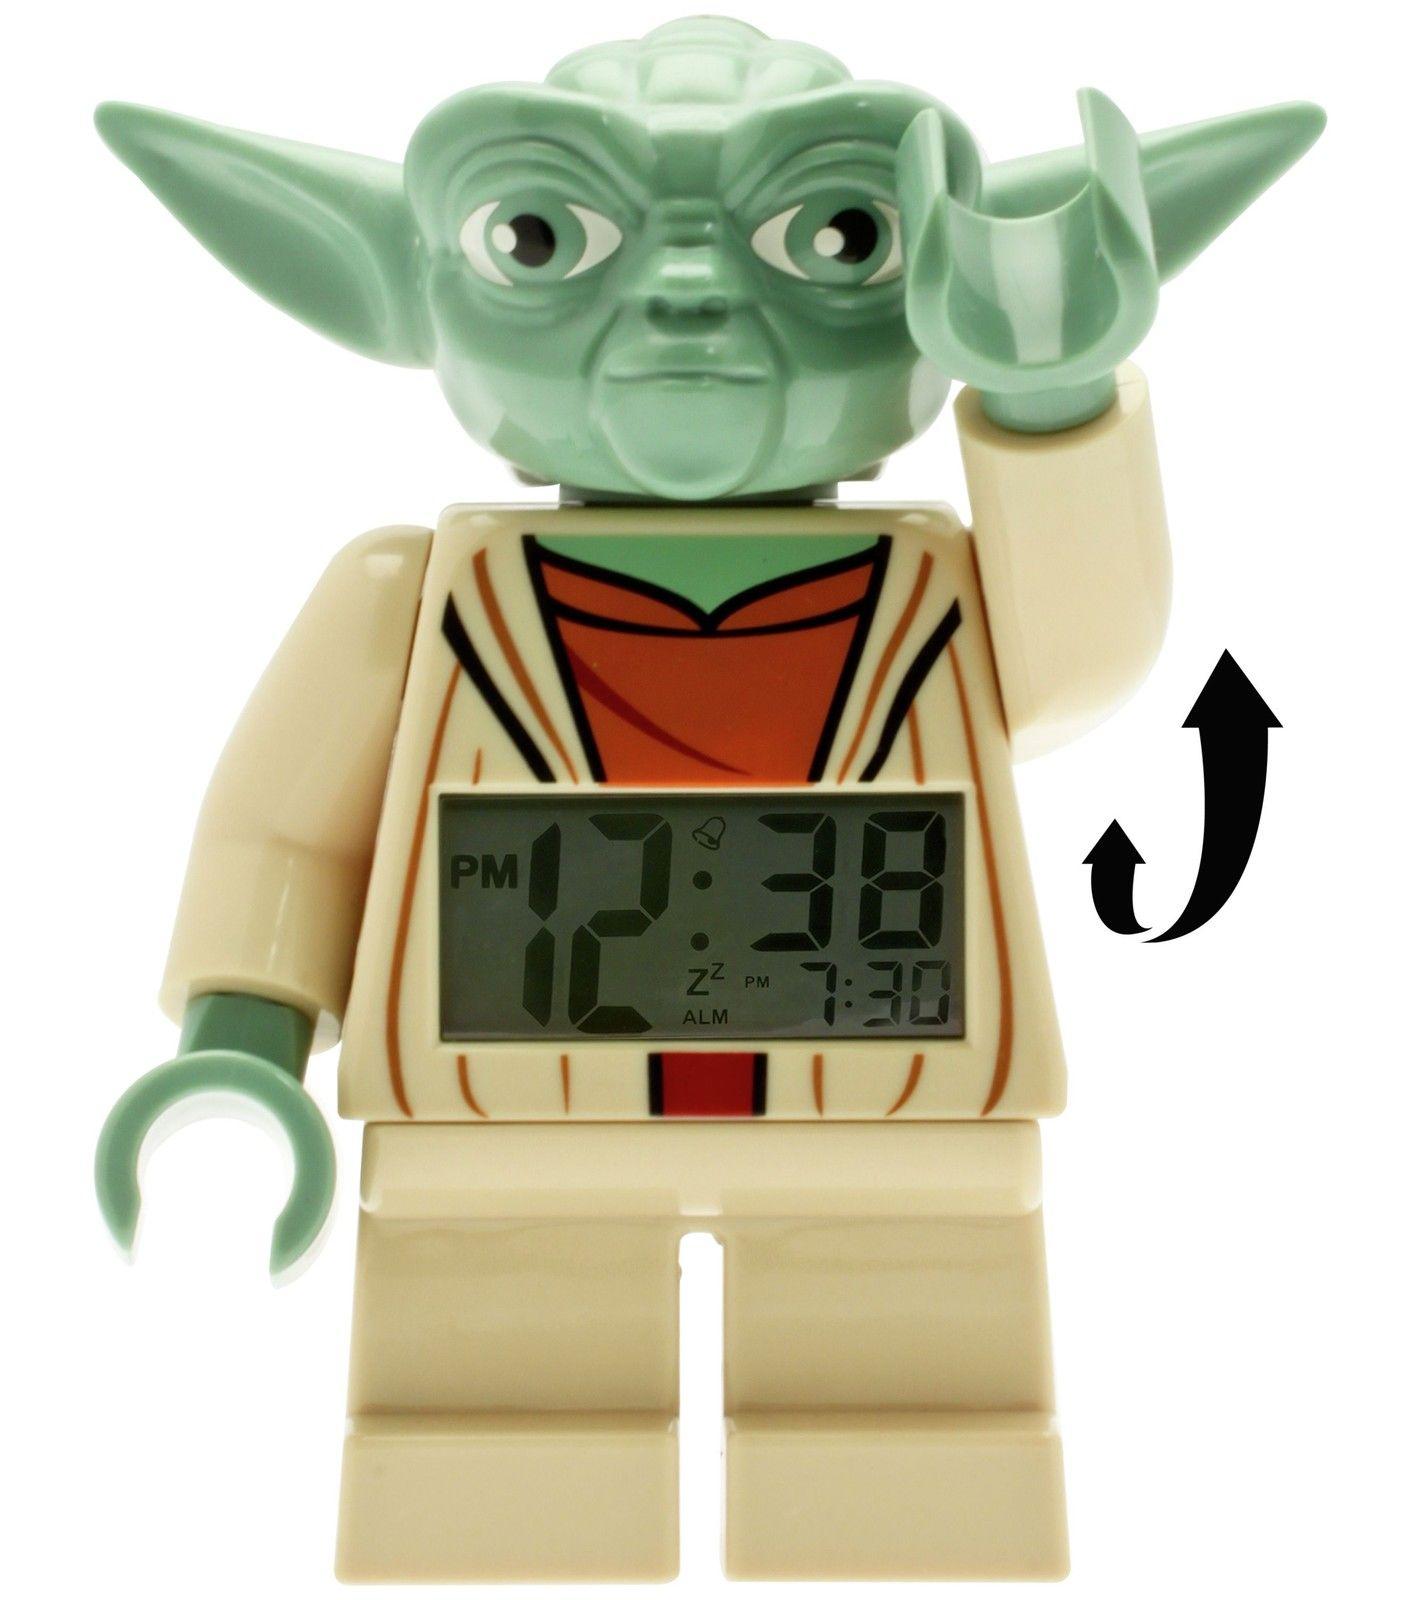 Alarm clock wake you up it will! Lego Yoda alarm clock £9.99 - Argos on eBay